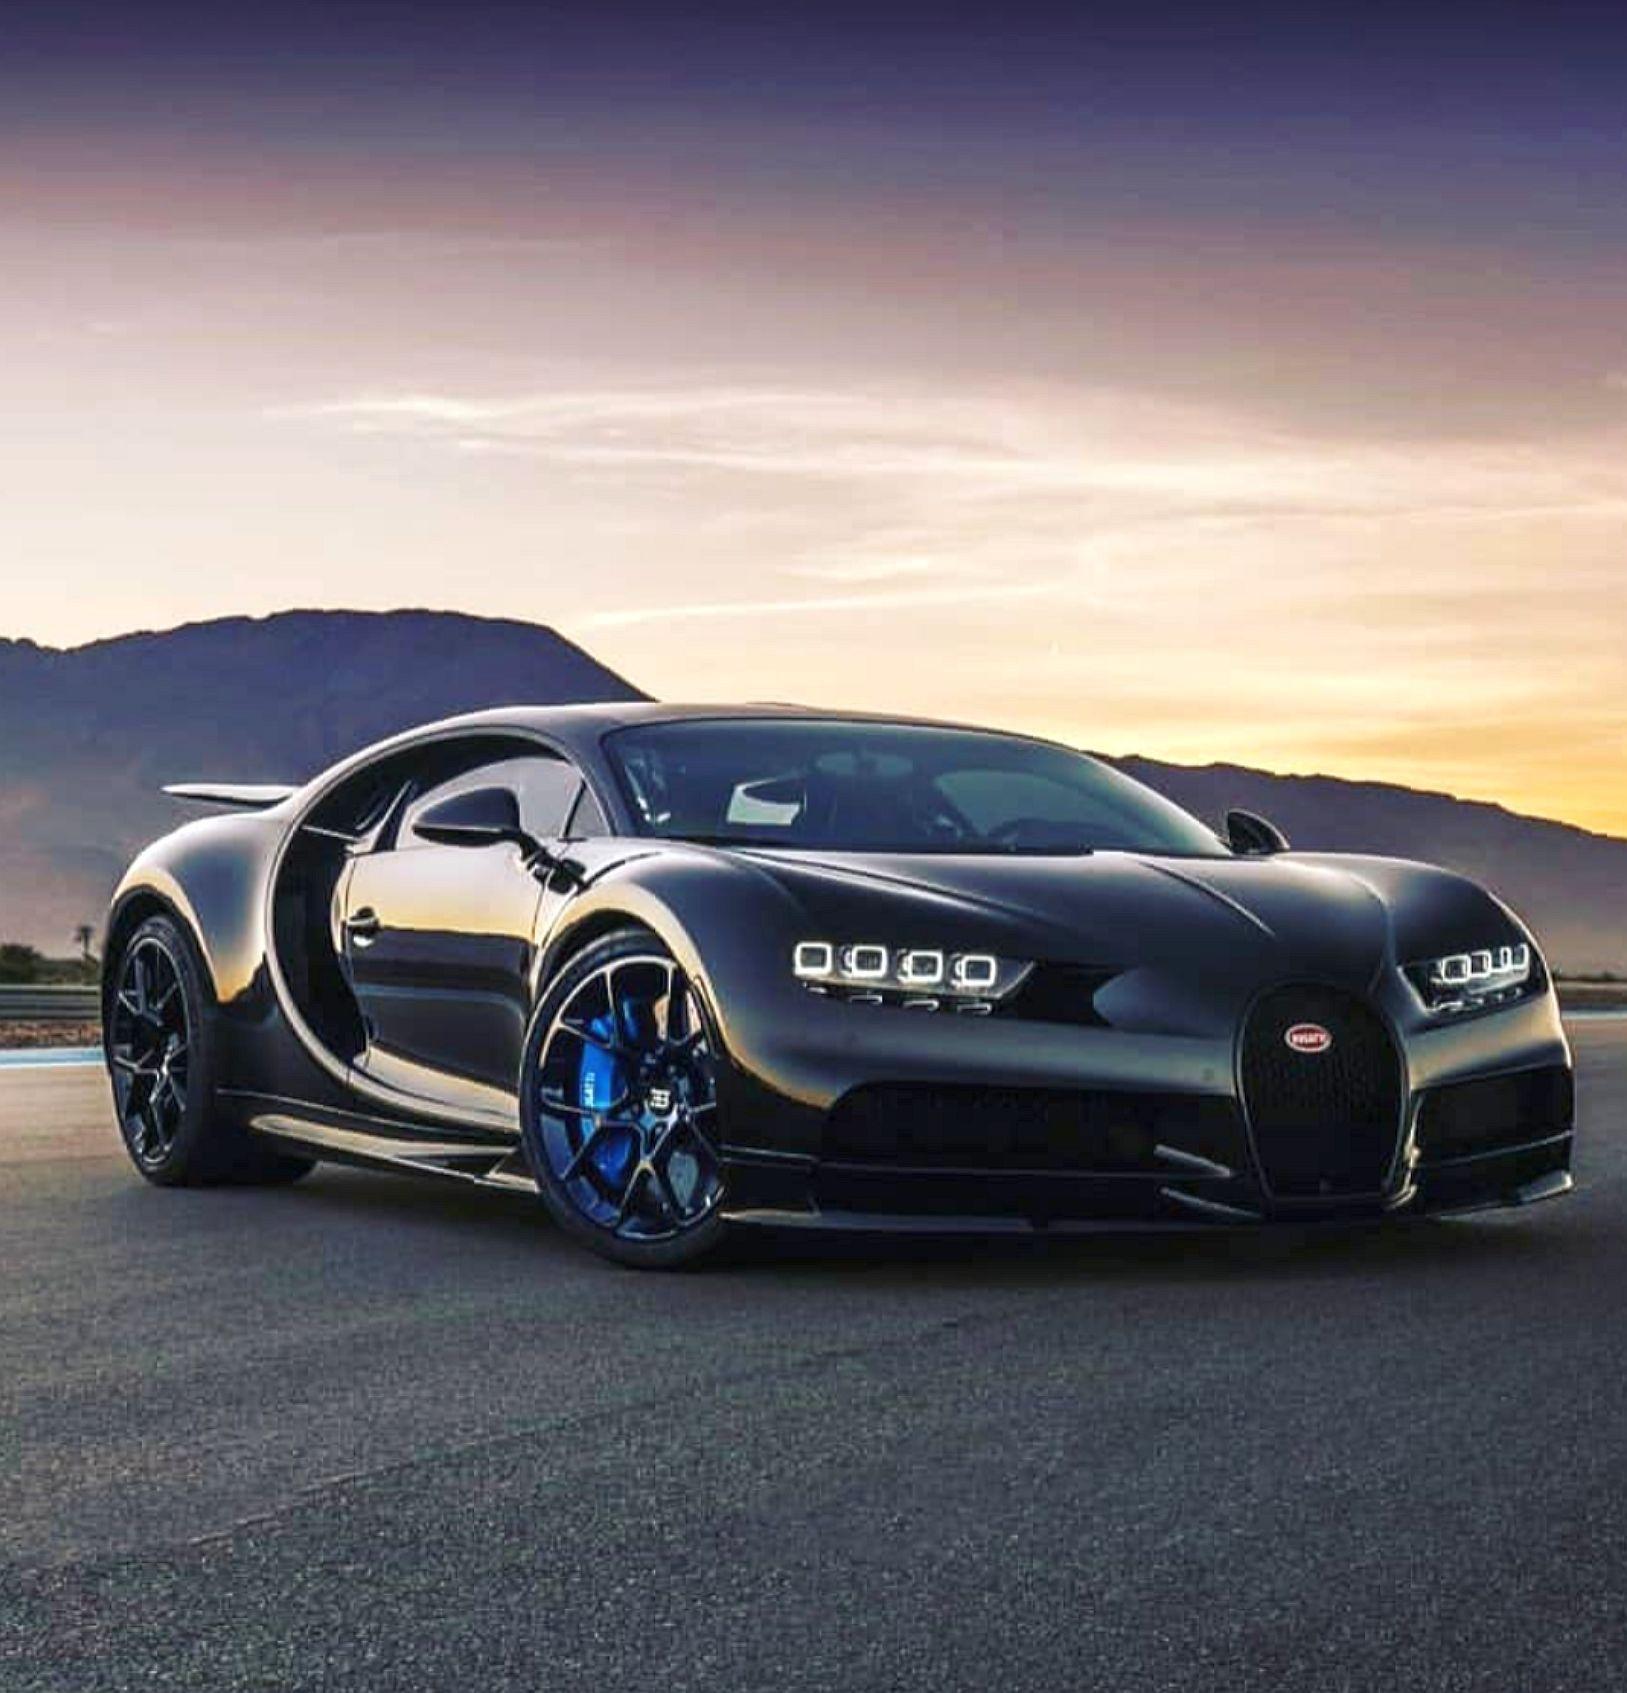 Best Super Sport Cars Bugatti Veyron Cars Bugatti Hypercars Sportcars Supercars Luxurycars Veyron Chiron Bugatti Veyron Bugatti Super Sport